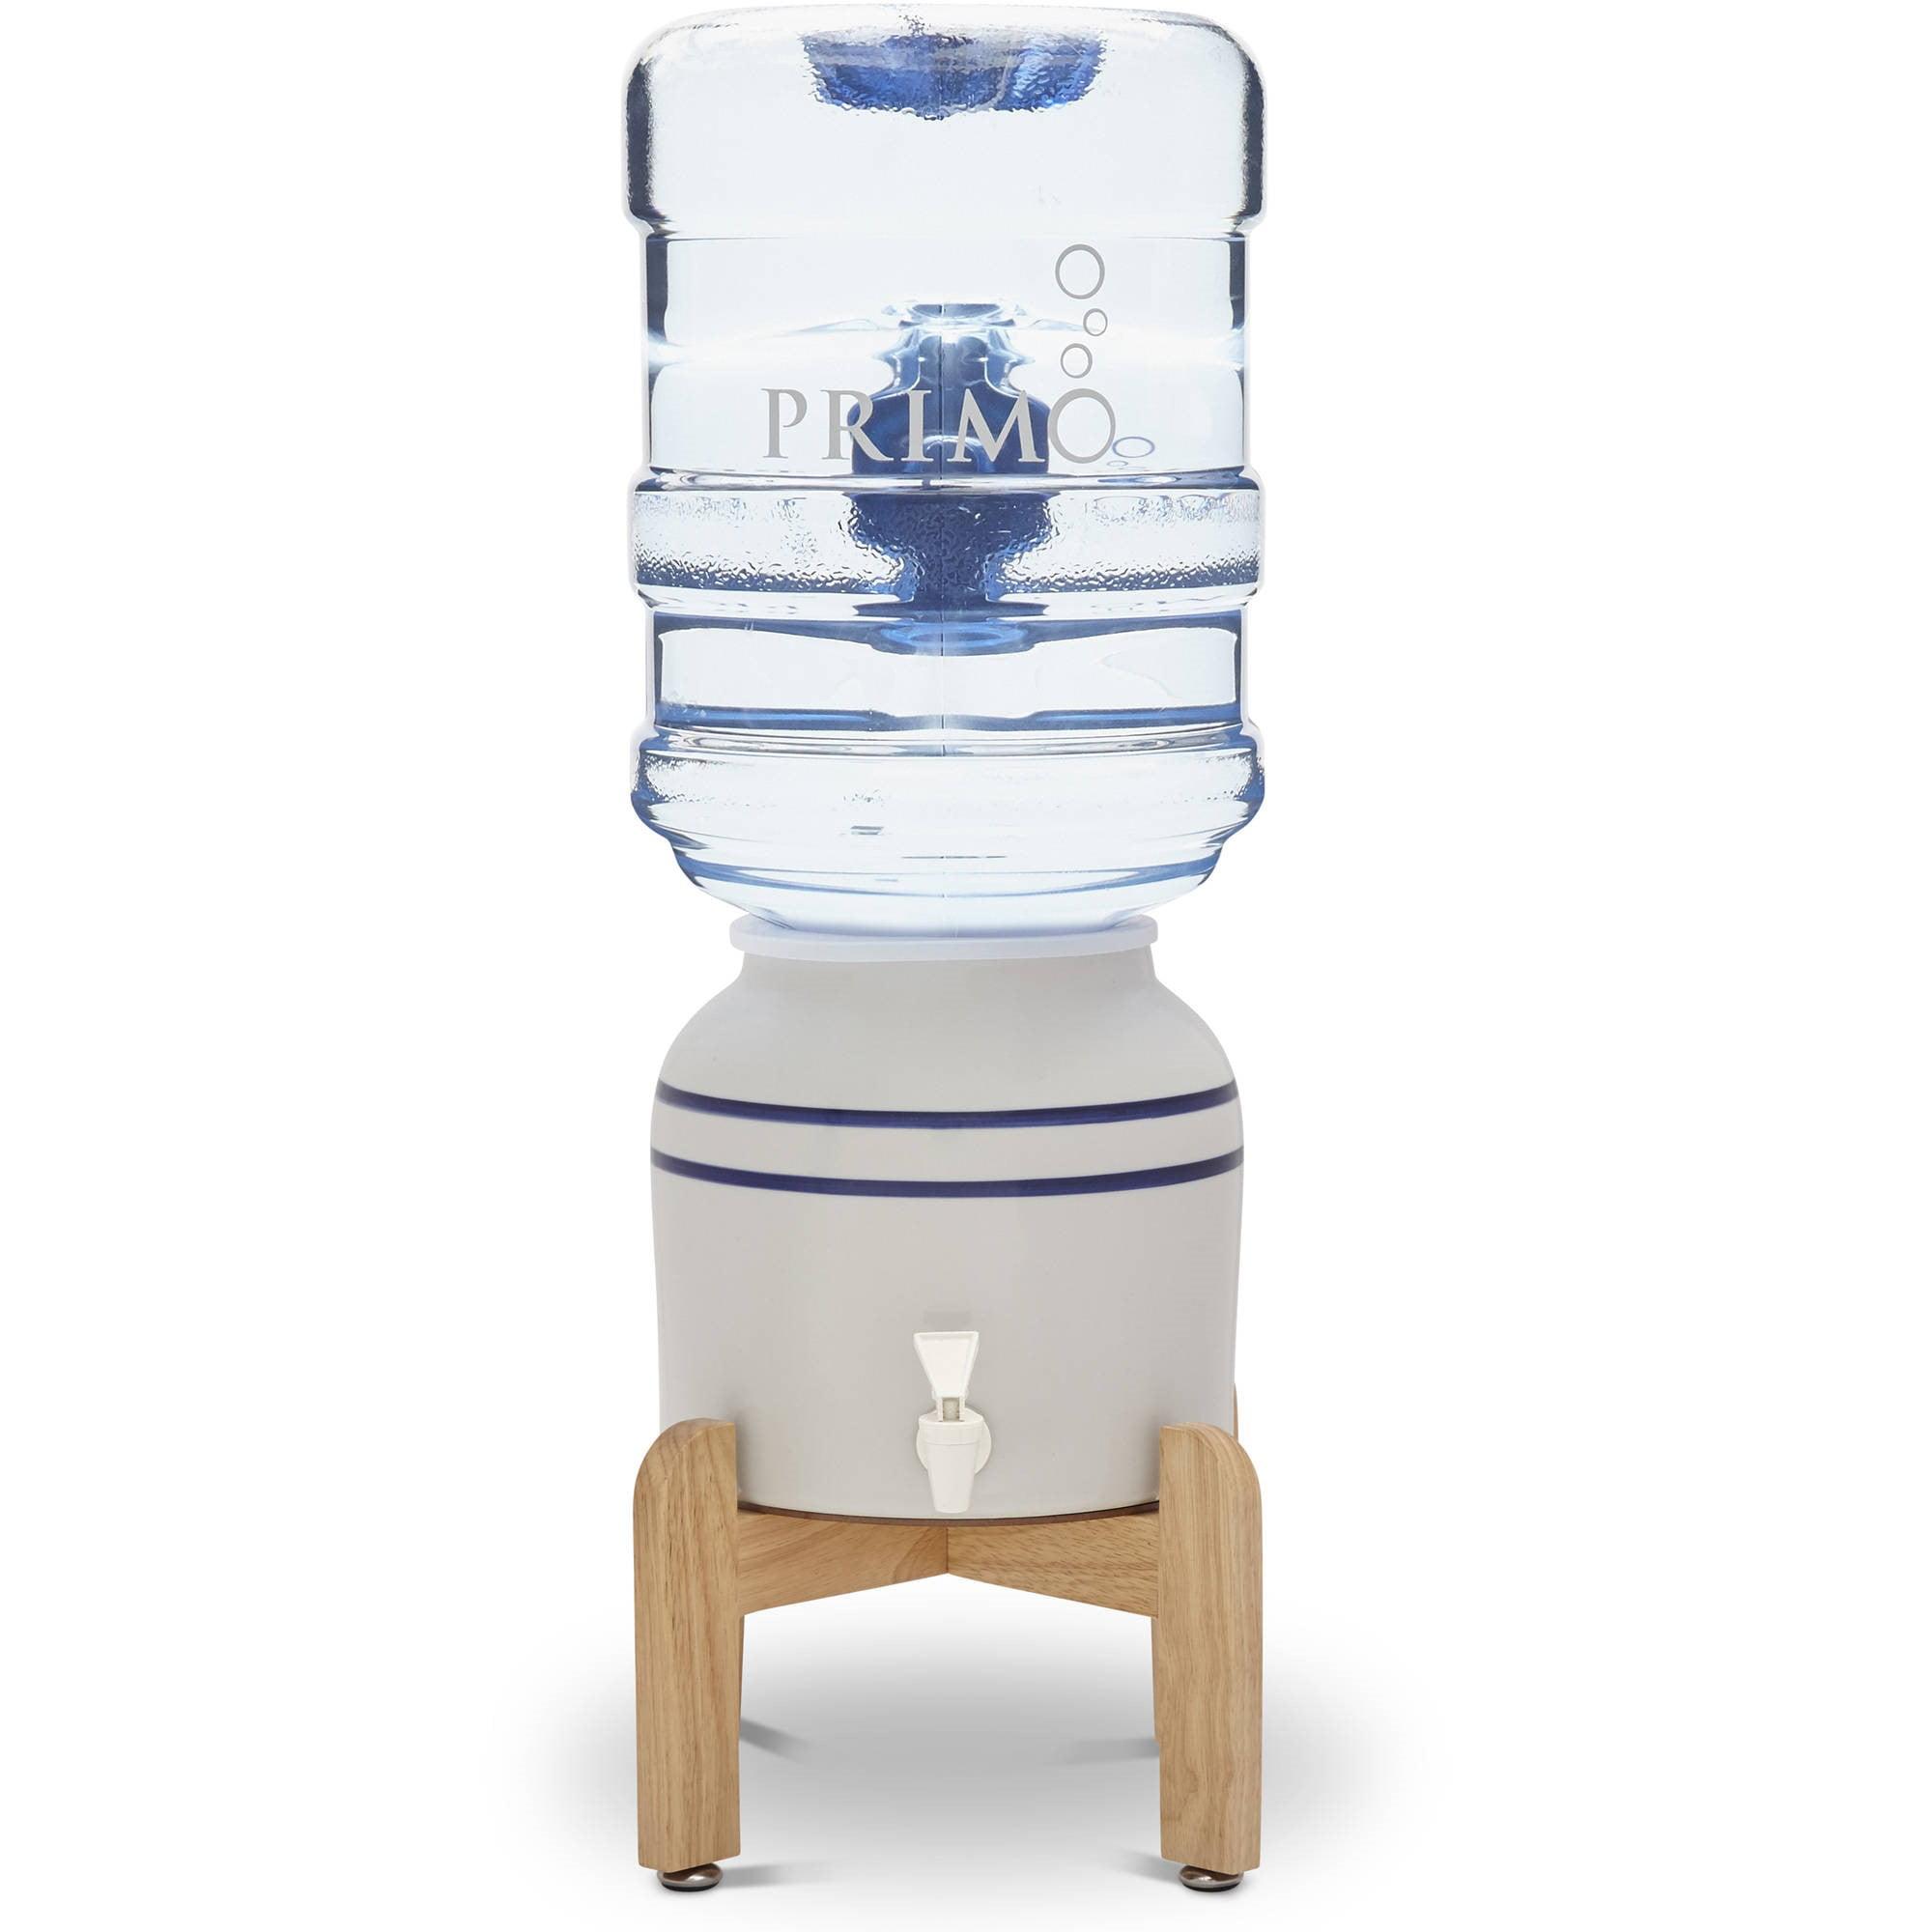 Primo Ceramic Crock Water Dispenser With Stand Walmart Com